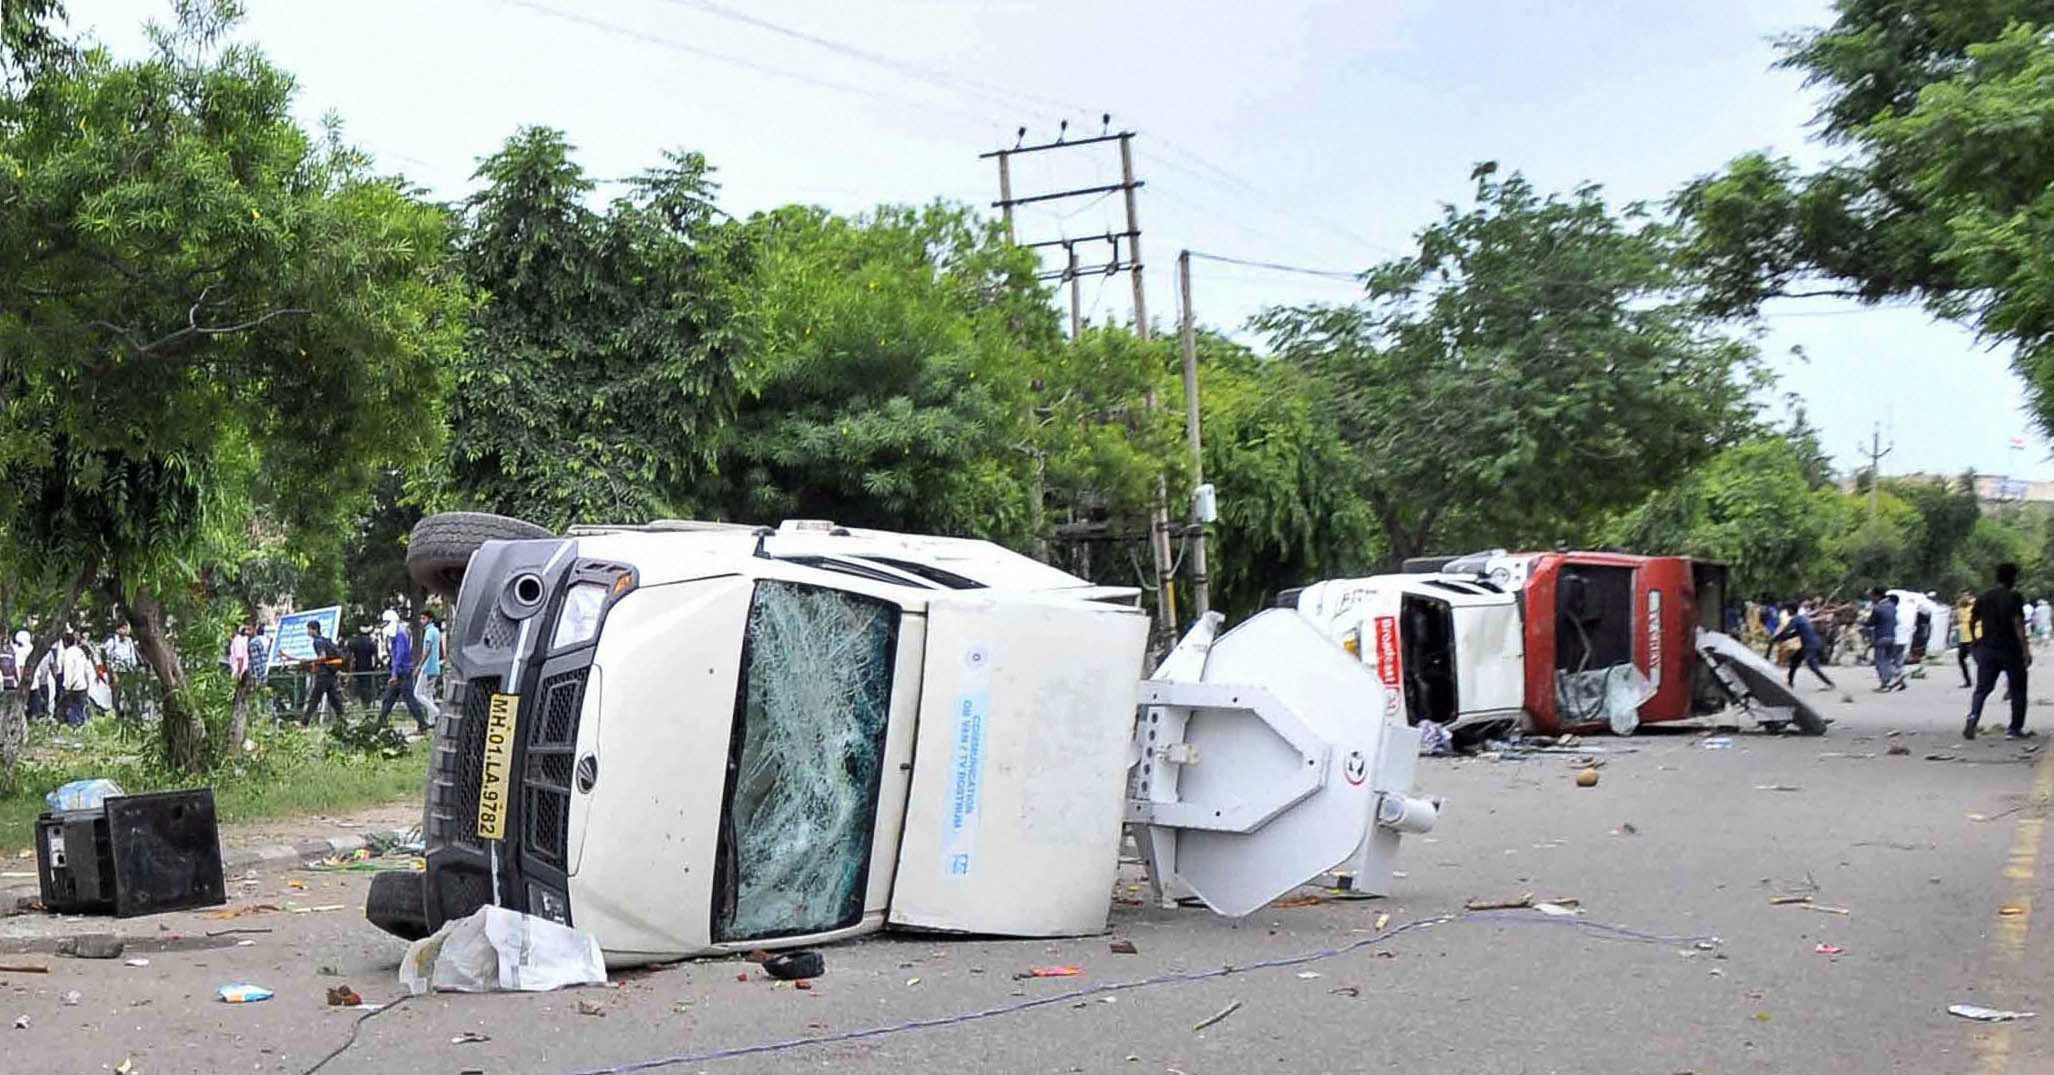 Panchkula: Vehicles burn in violence following Dera Sacha Sauda chief Gurmeet Ram Rahim's conviction in Panchkula on Friday. PTI Photo (PTI8_25_2017_000166A)